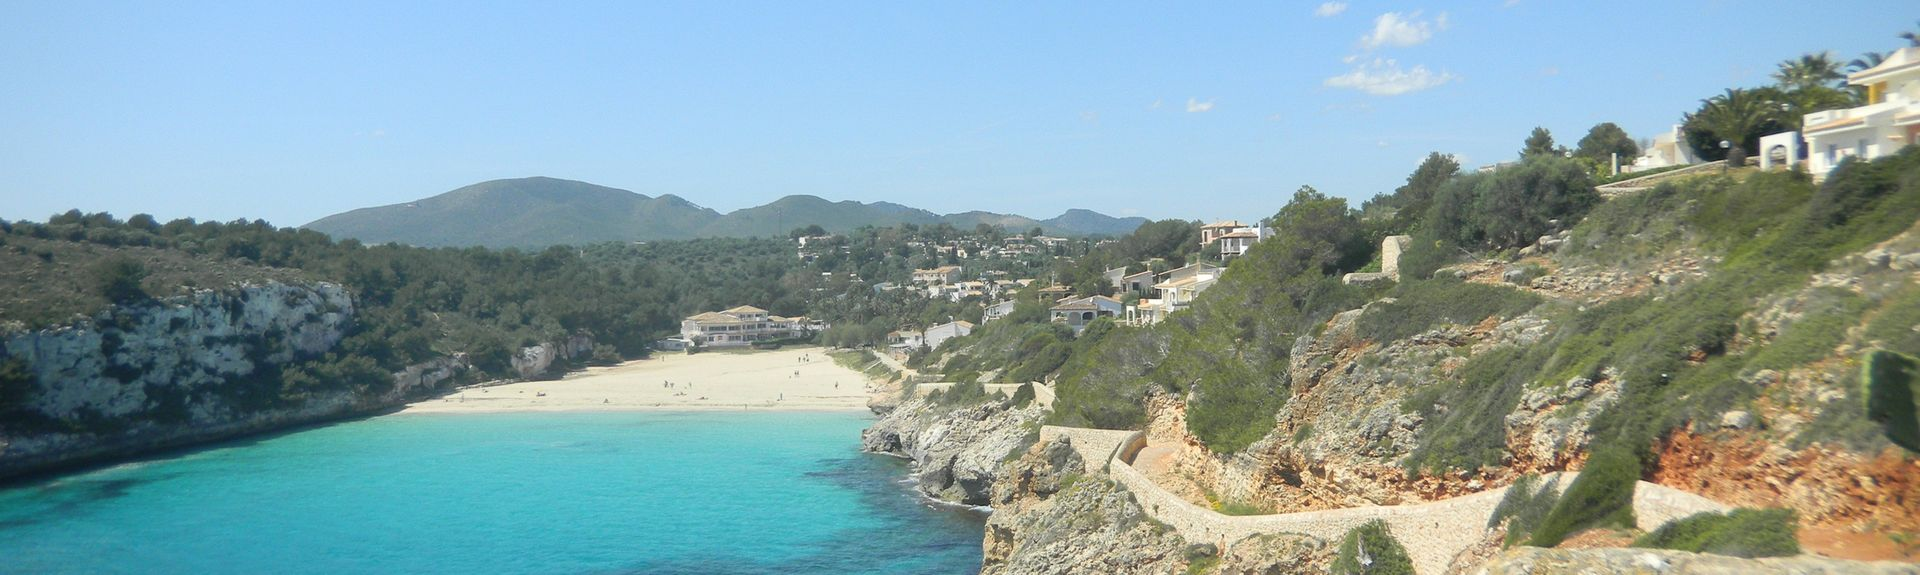 Cala Mandia, Balearerna, Spanien